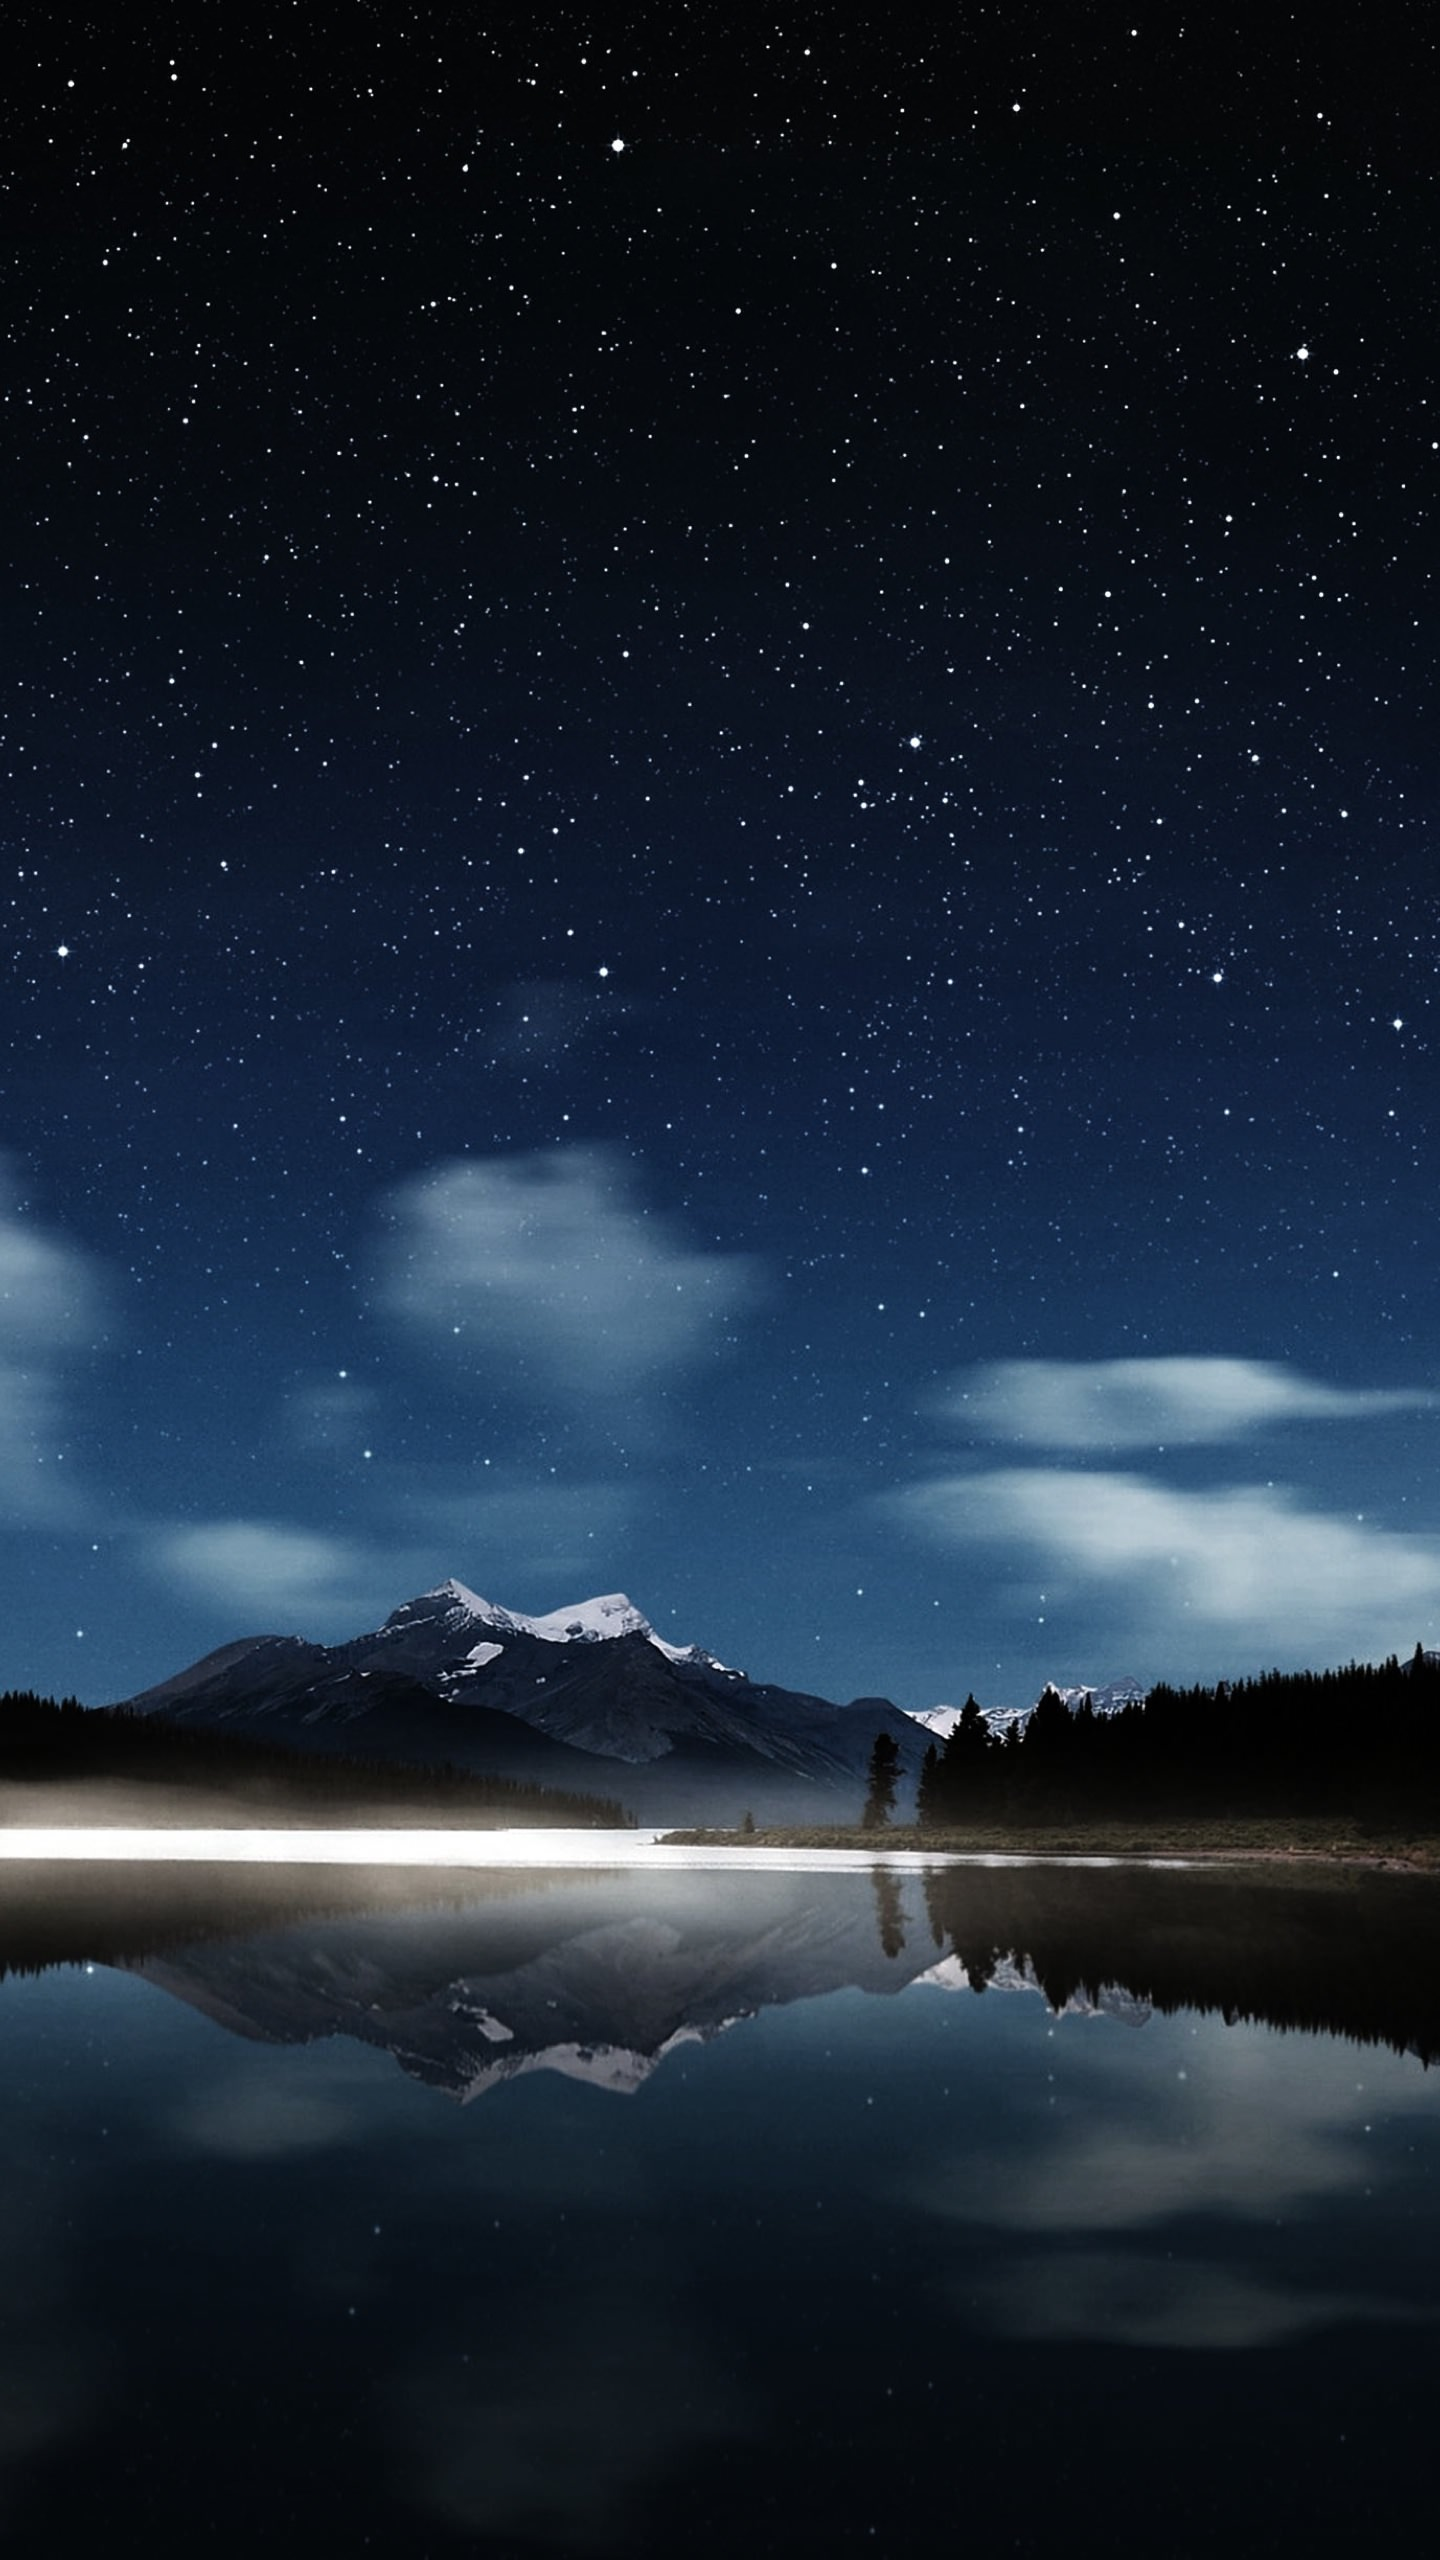 Landscape Night